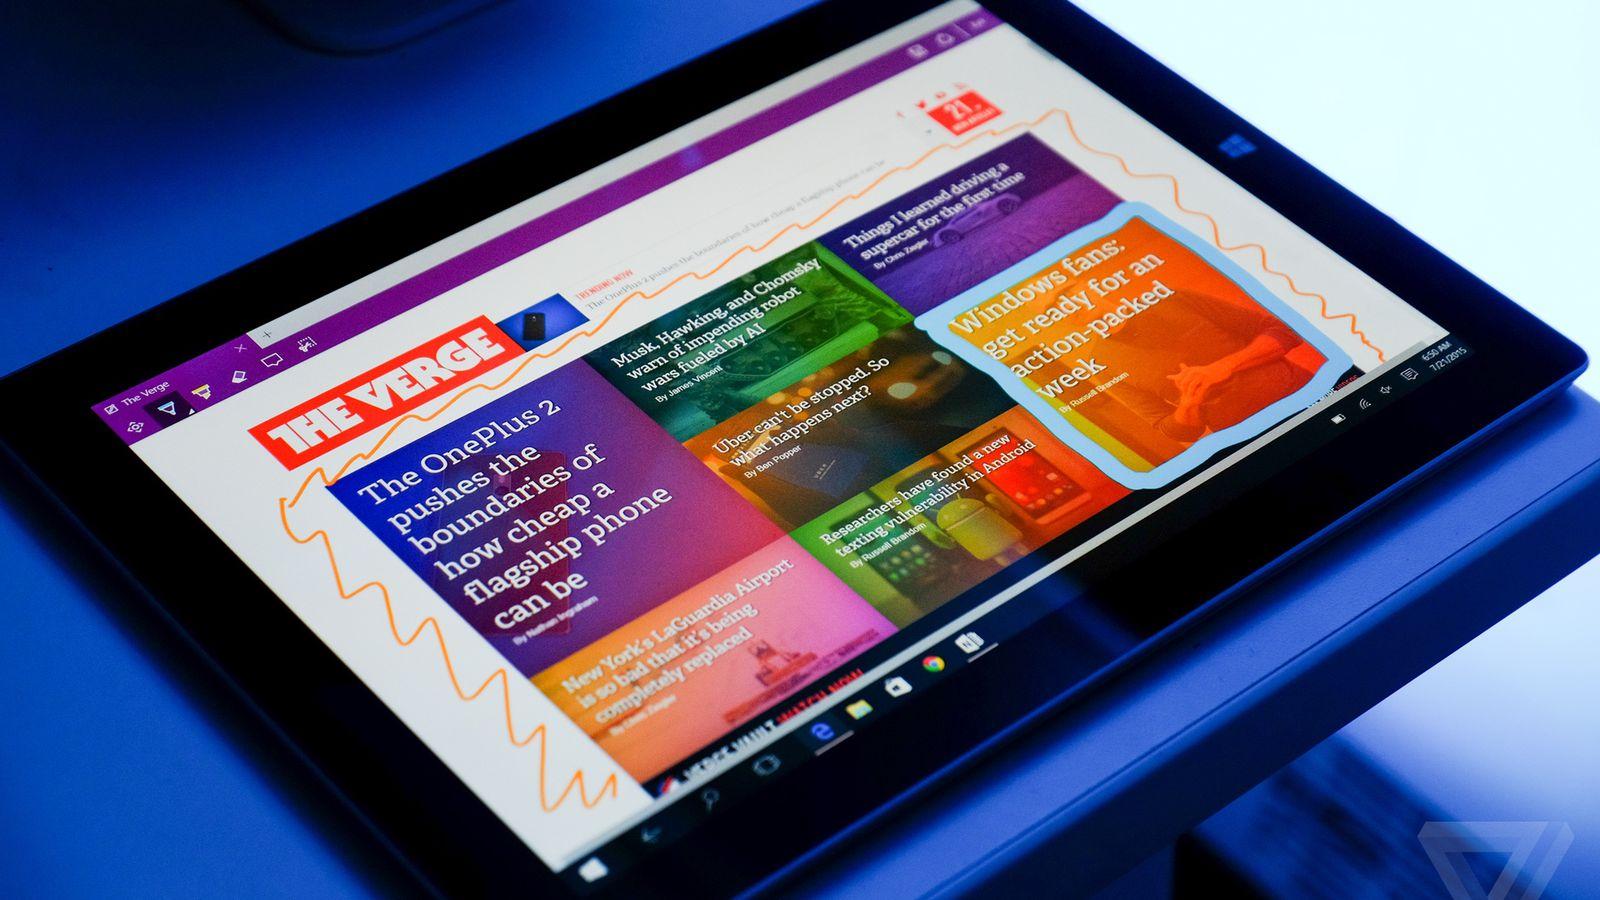 10 million people now help Microsoft test Windows 10